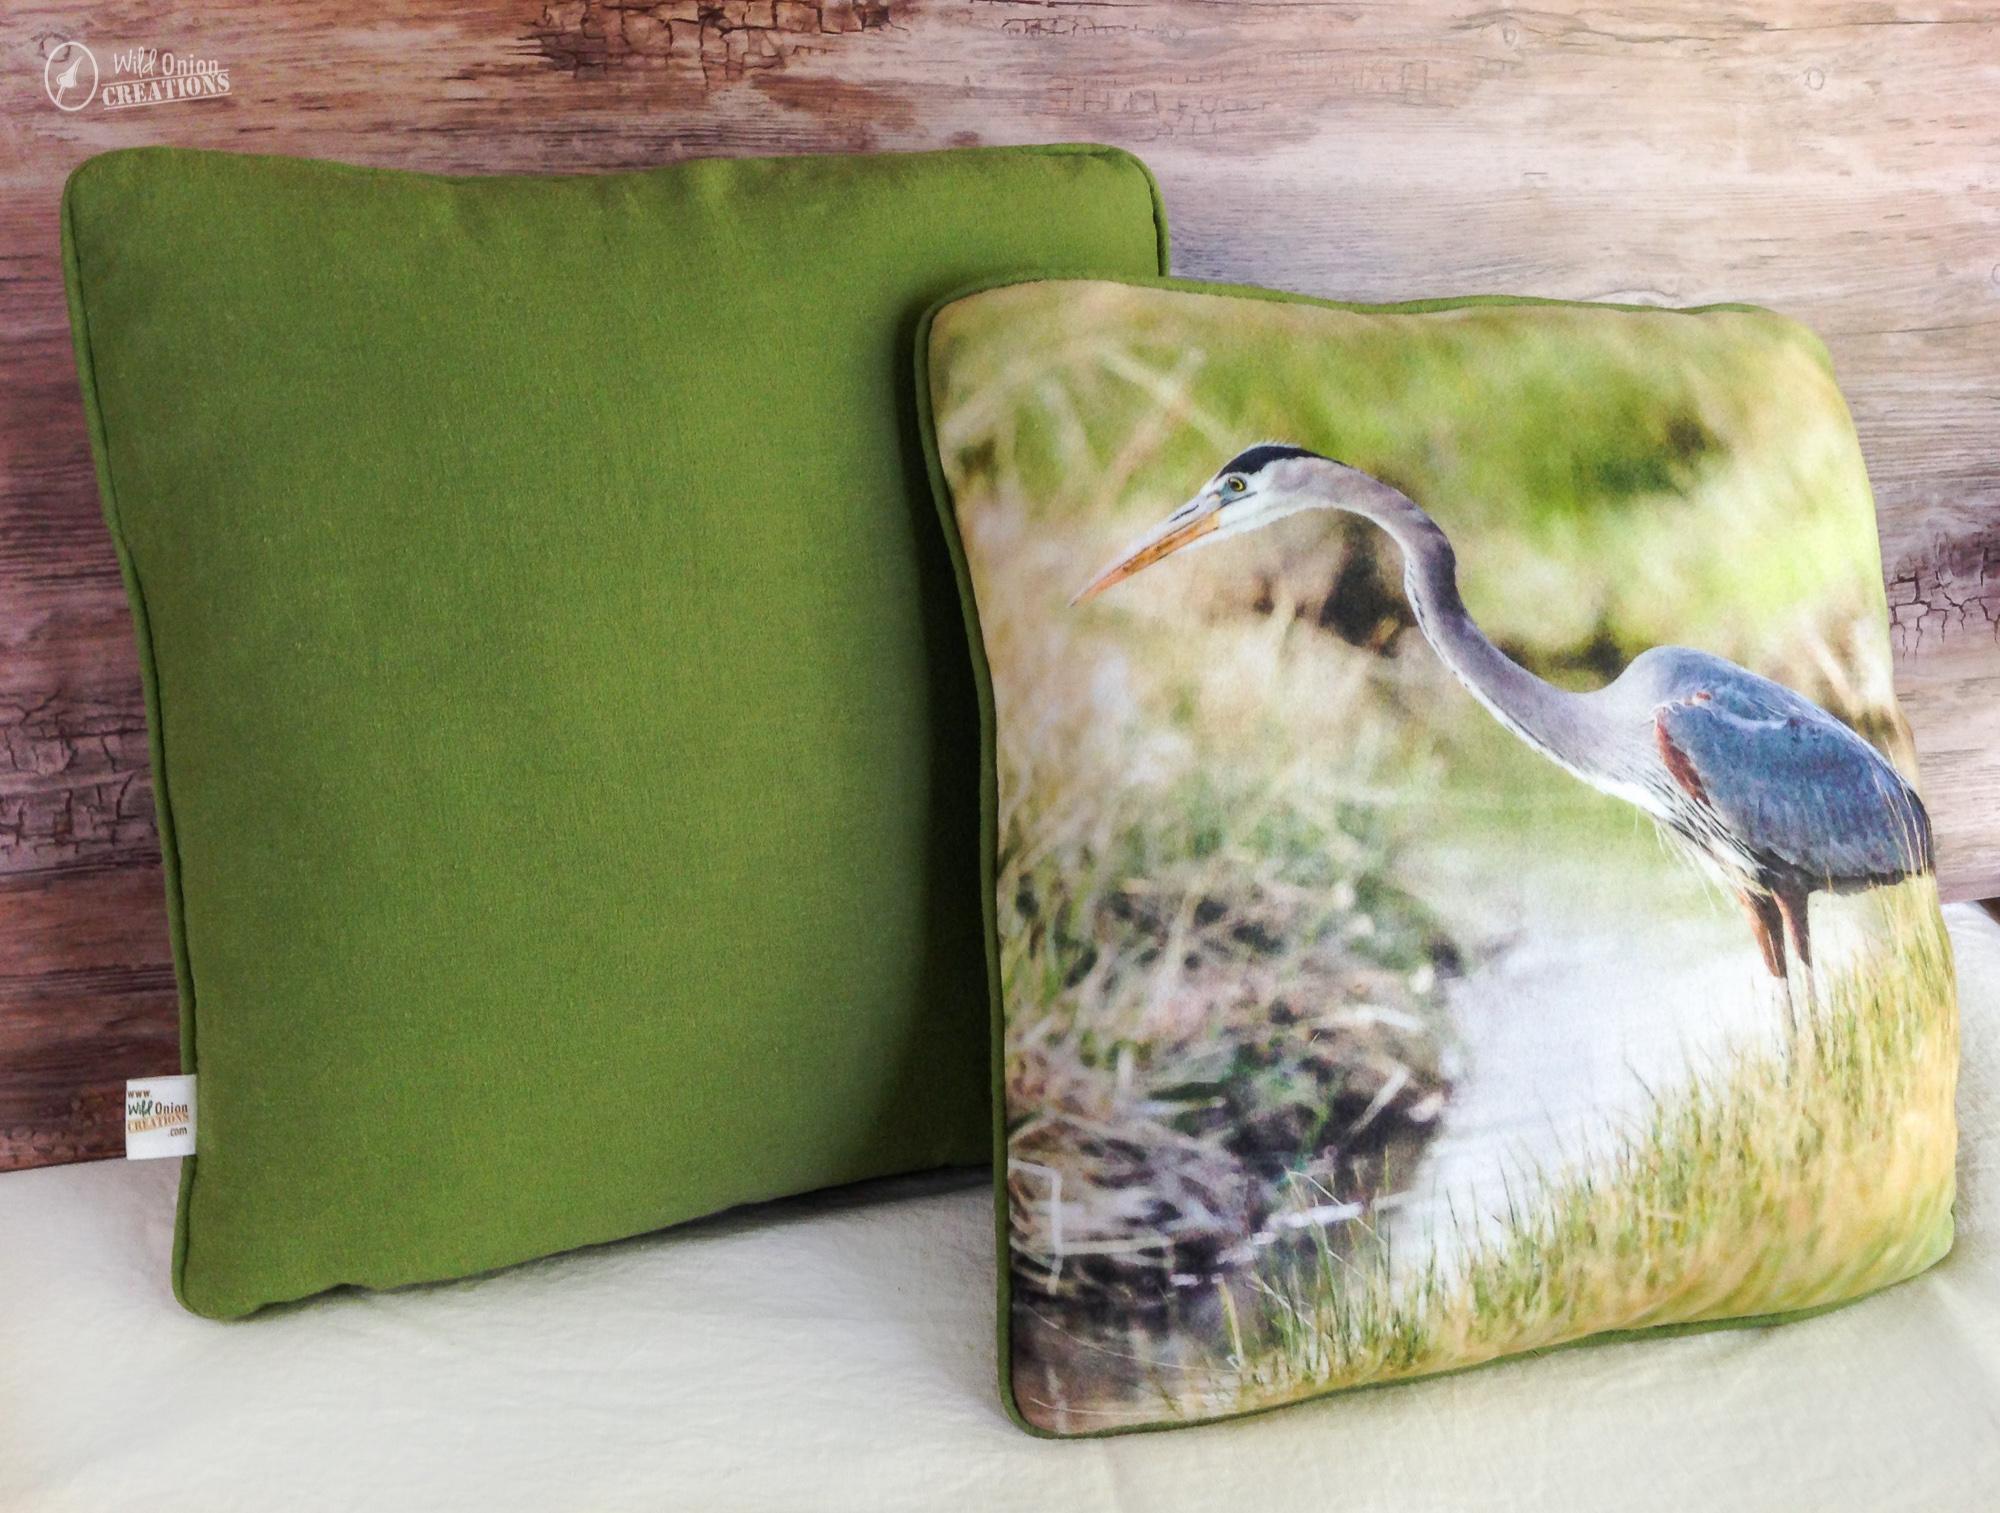 Blue Heron Throw Pillows : Birds Throw Pillow with Photo of Great Blue Heron Fishing